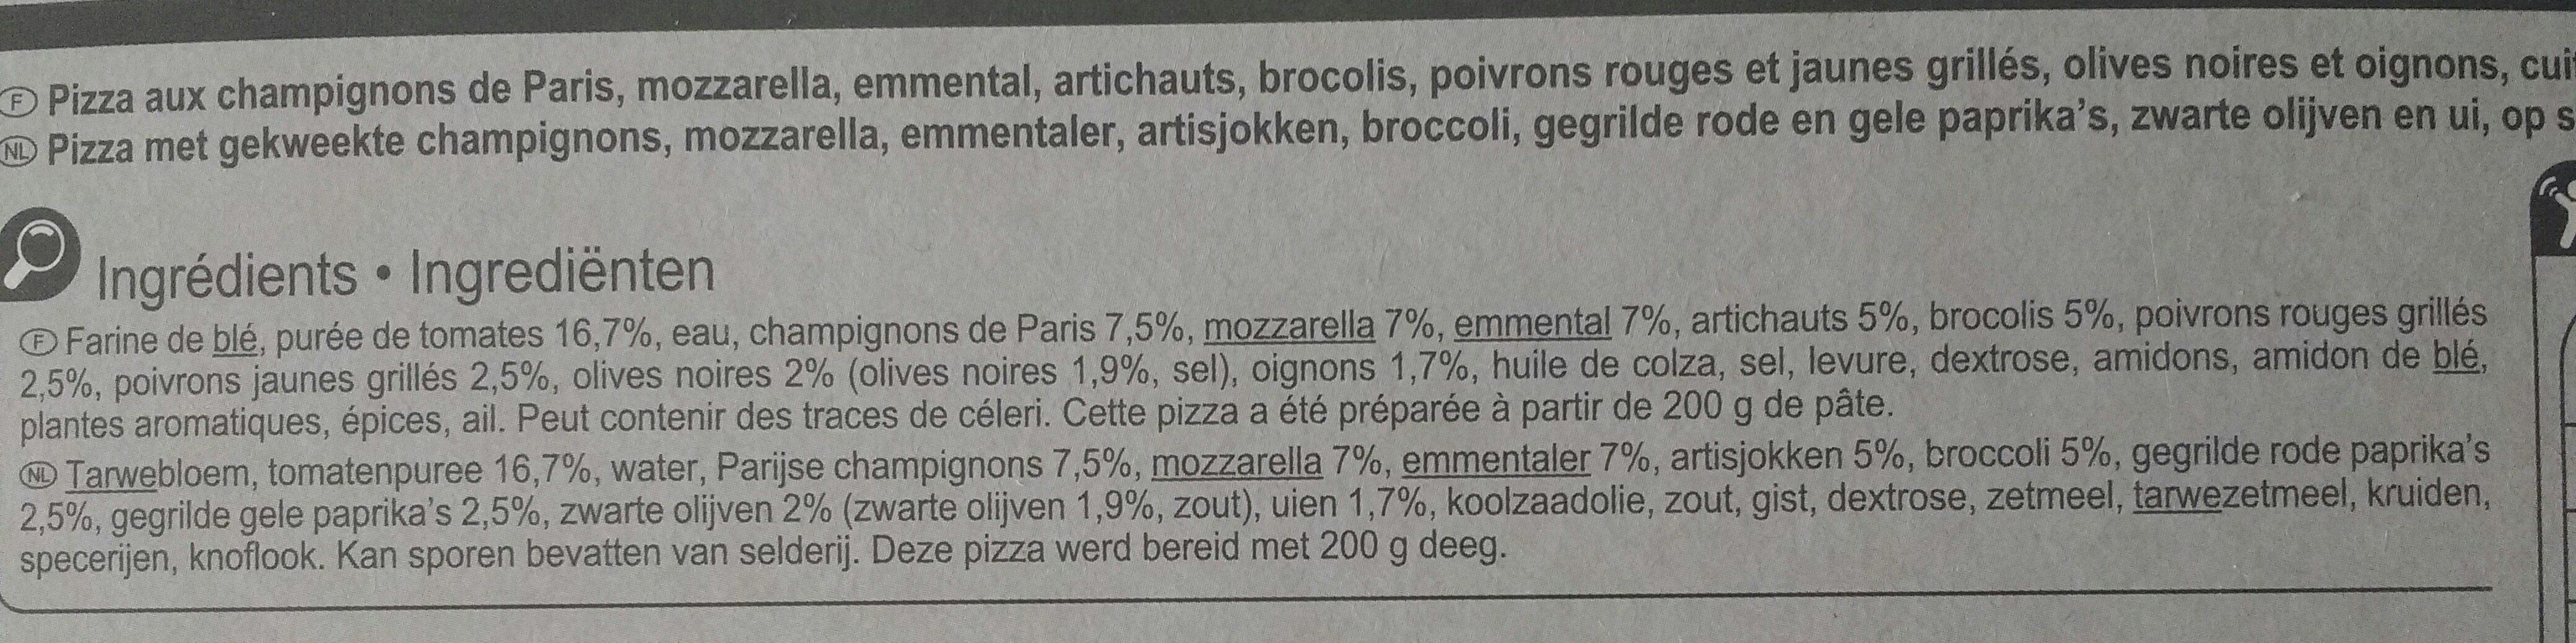 Pizza 4 stagioni - Ingrédients